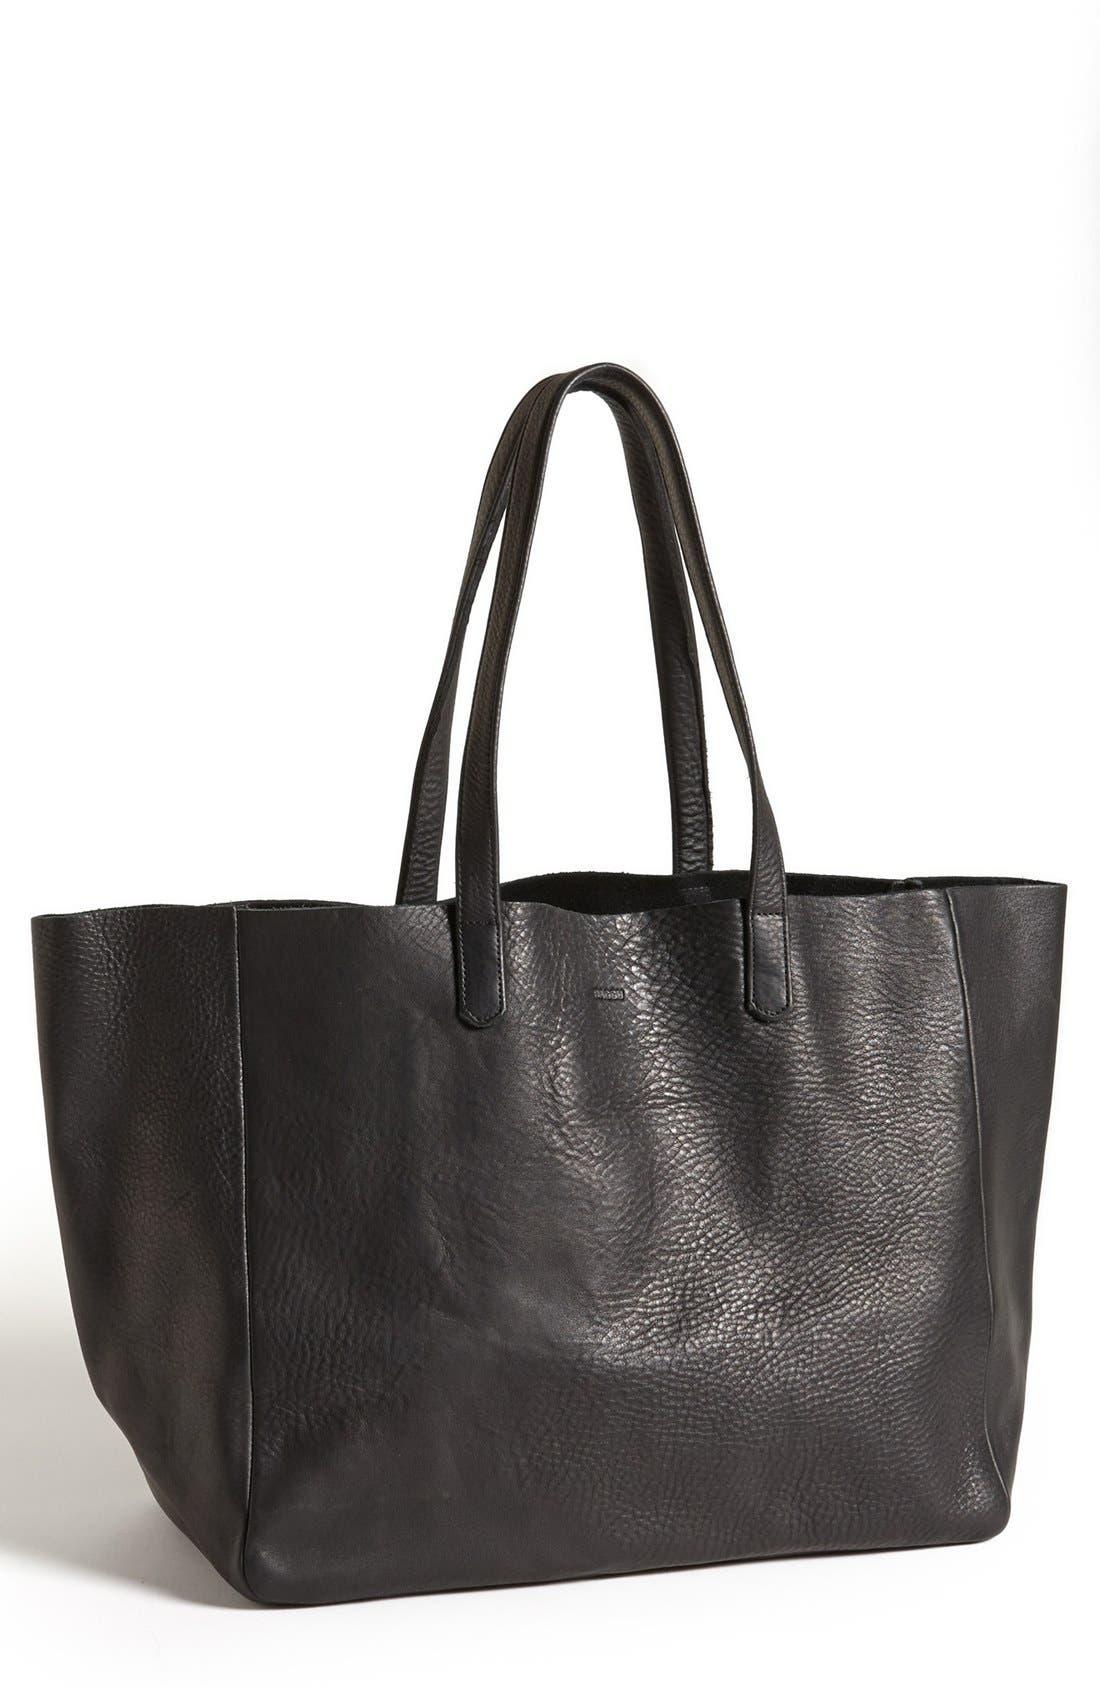 Alternate Image 1 Selected - Baggu Leather Tote